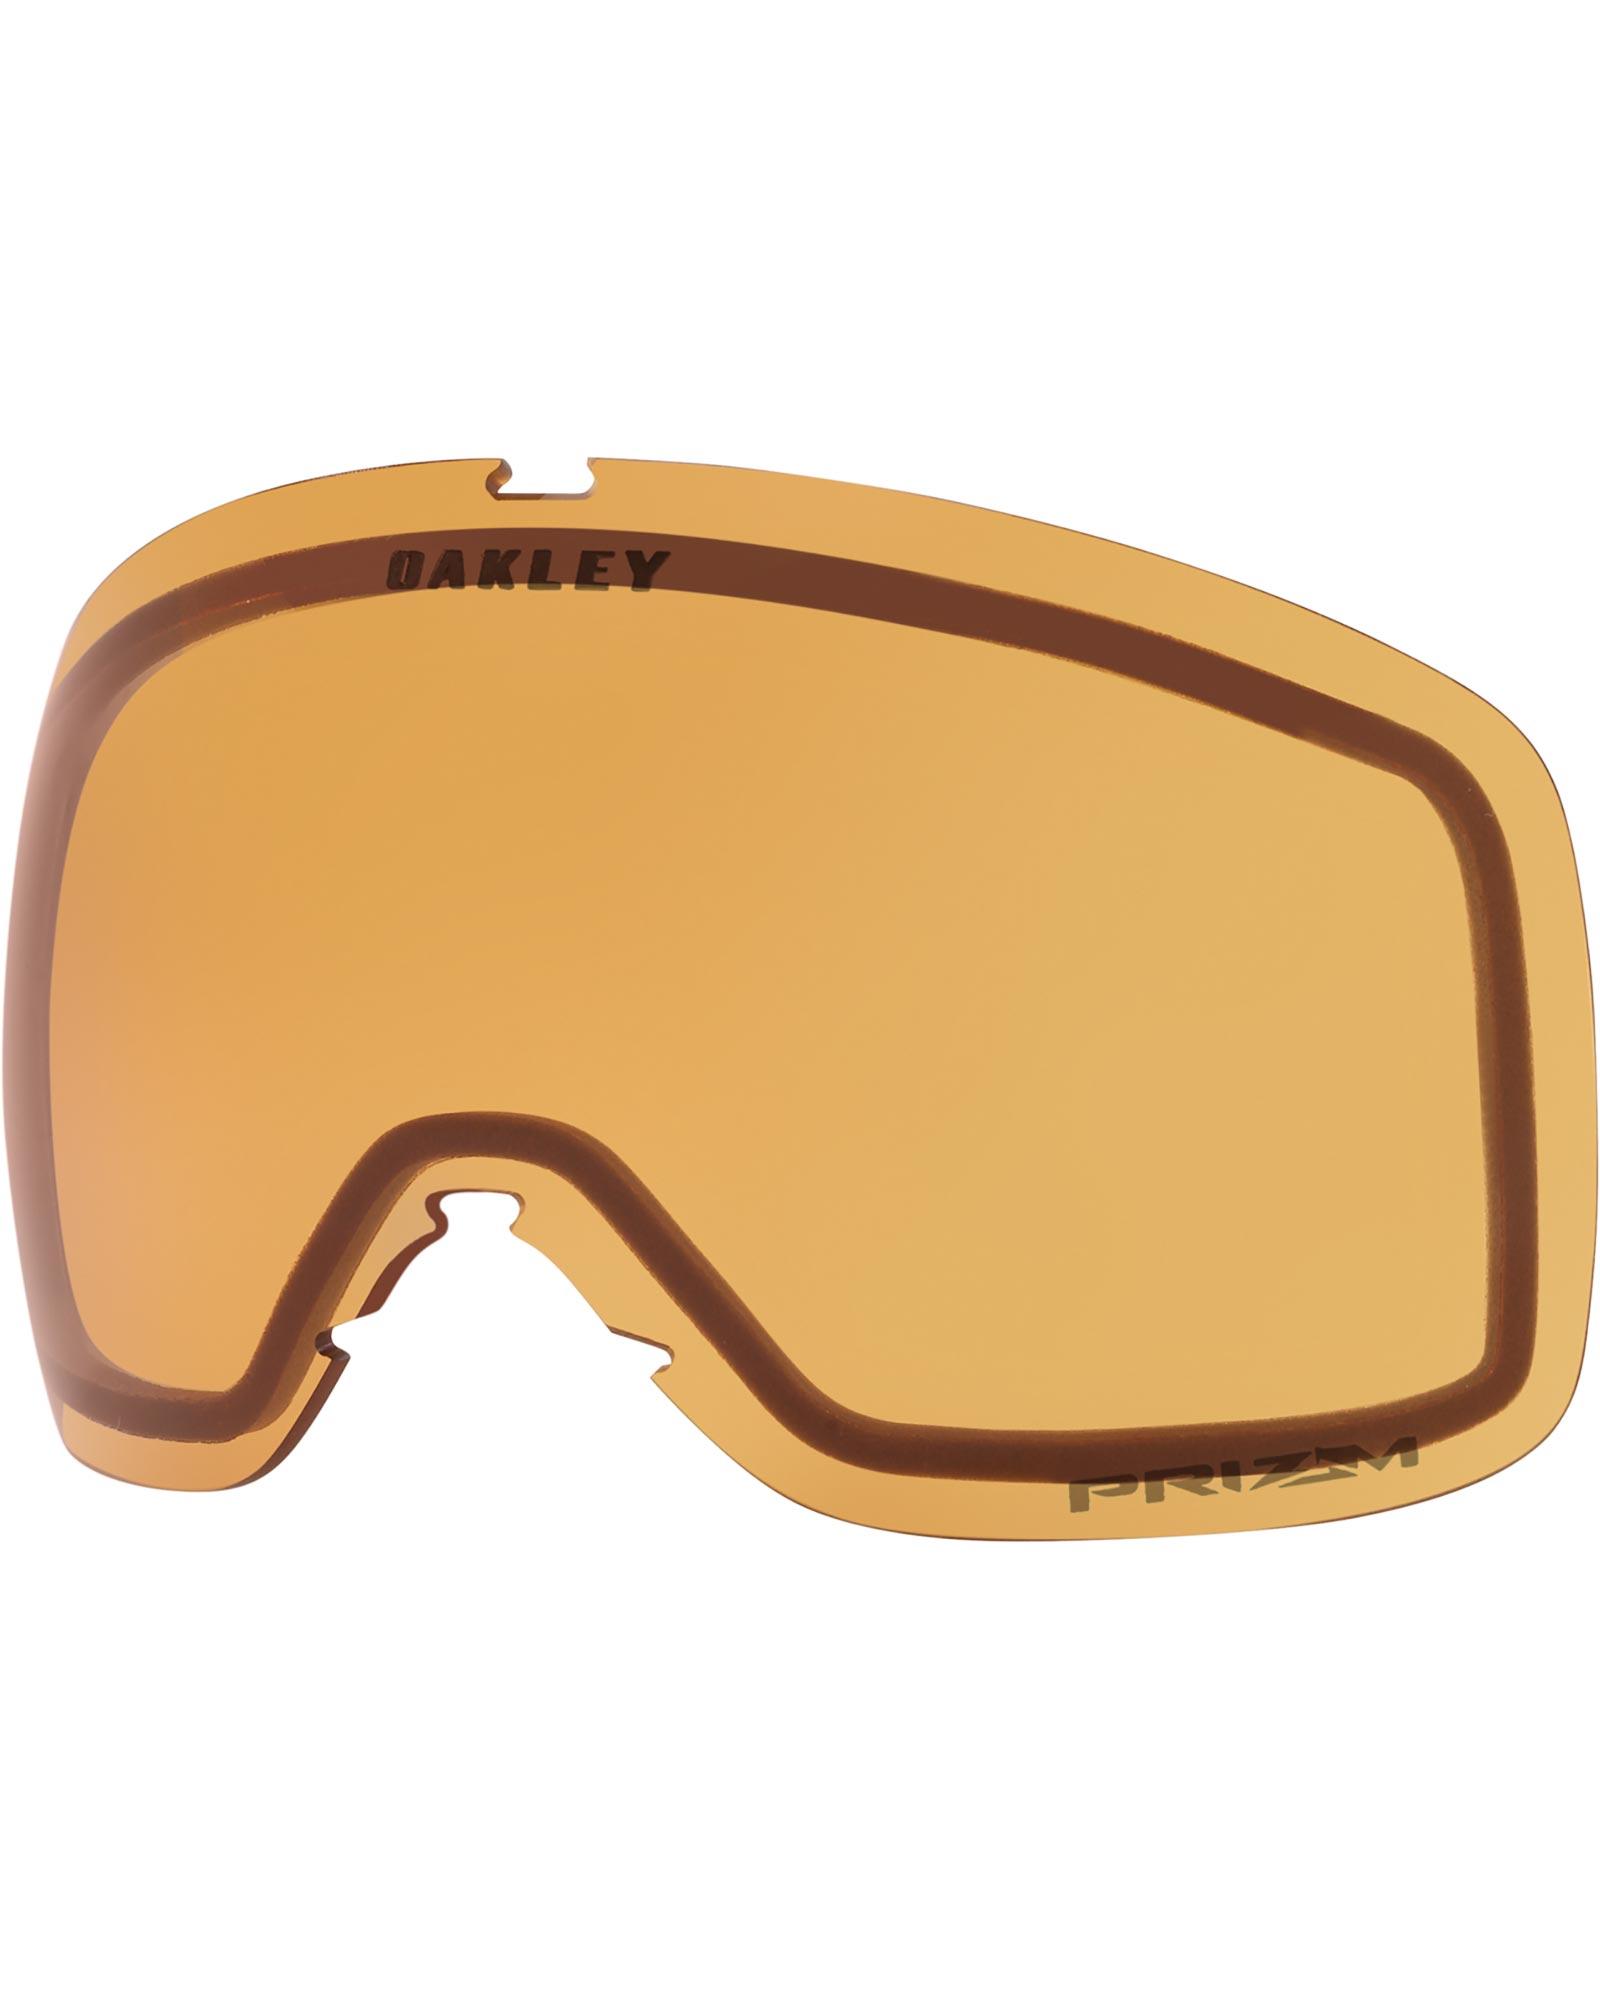 Oakley Flight Tracker XM Lens Prizm Persimmon Goggle Lens 2020 / 2021 0